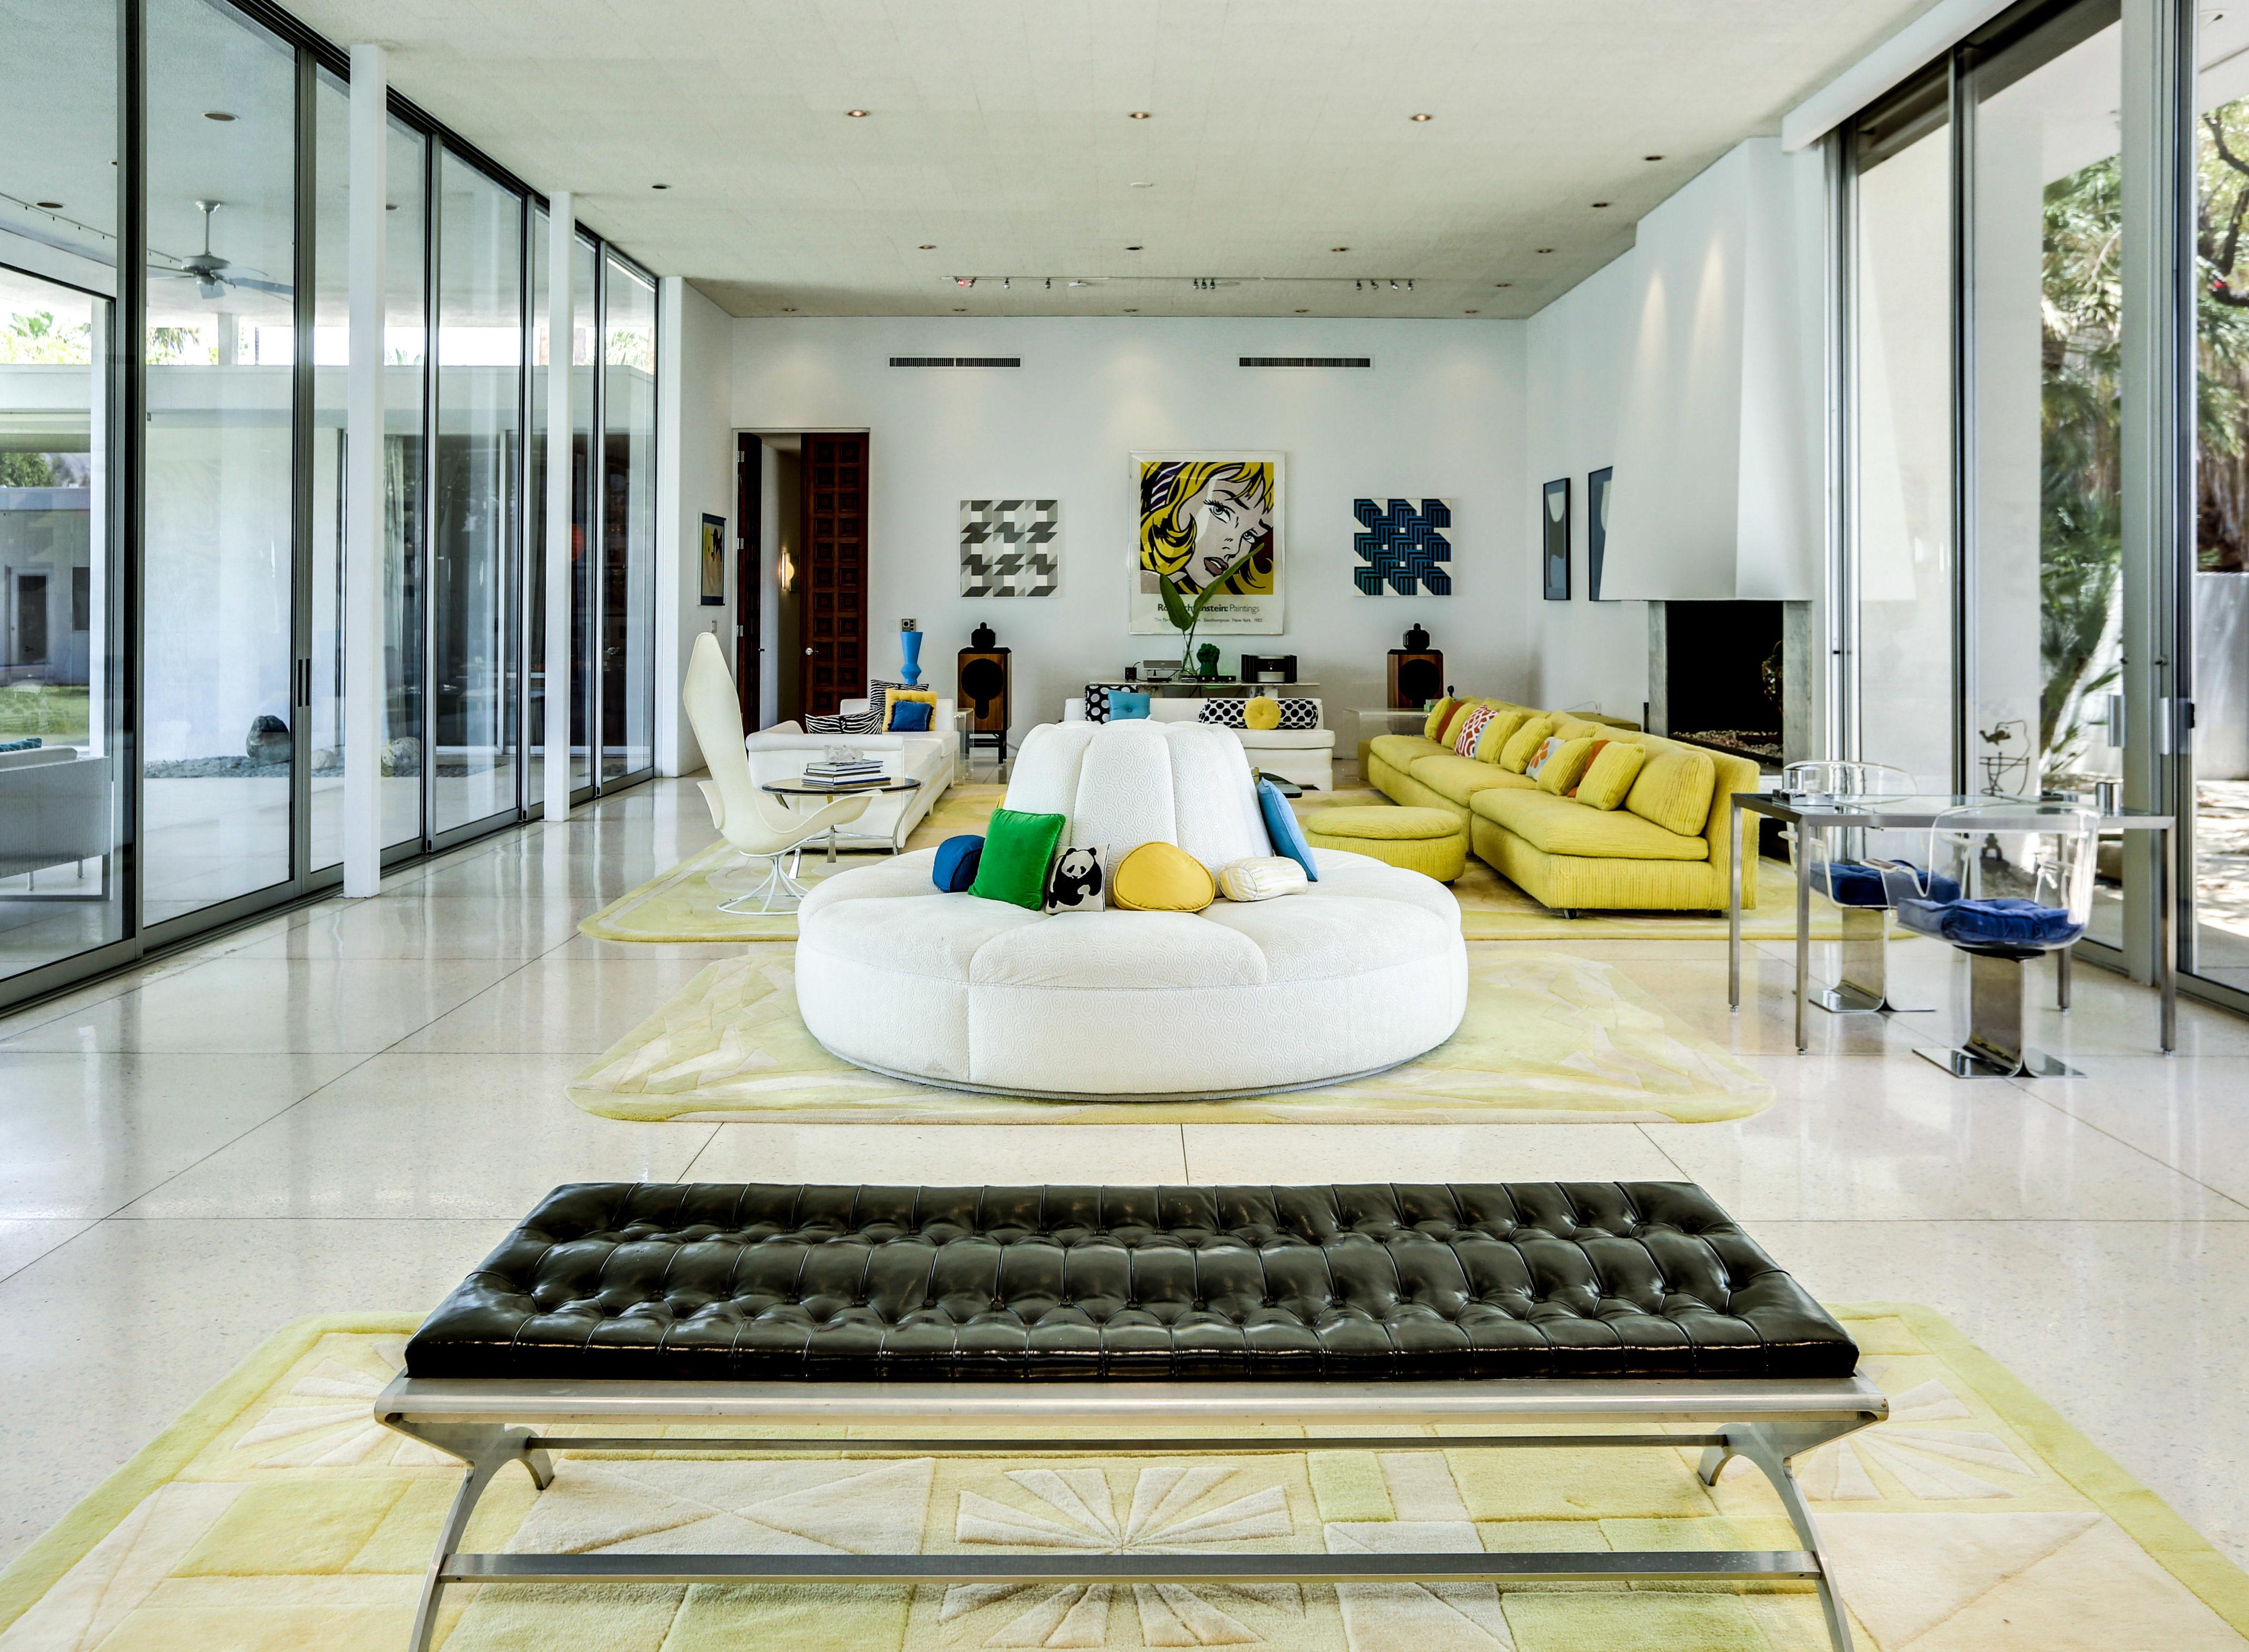 Beverly Hills Furniture Beverly Hills Furniture Action Coffee Table Beverly Hills Furniture